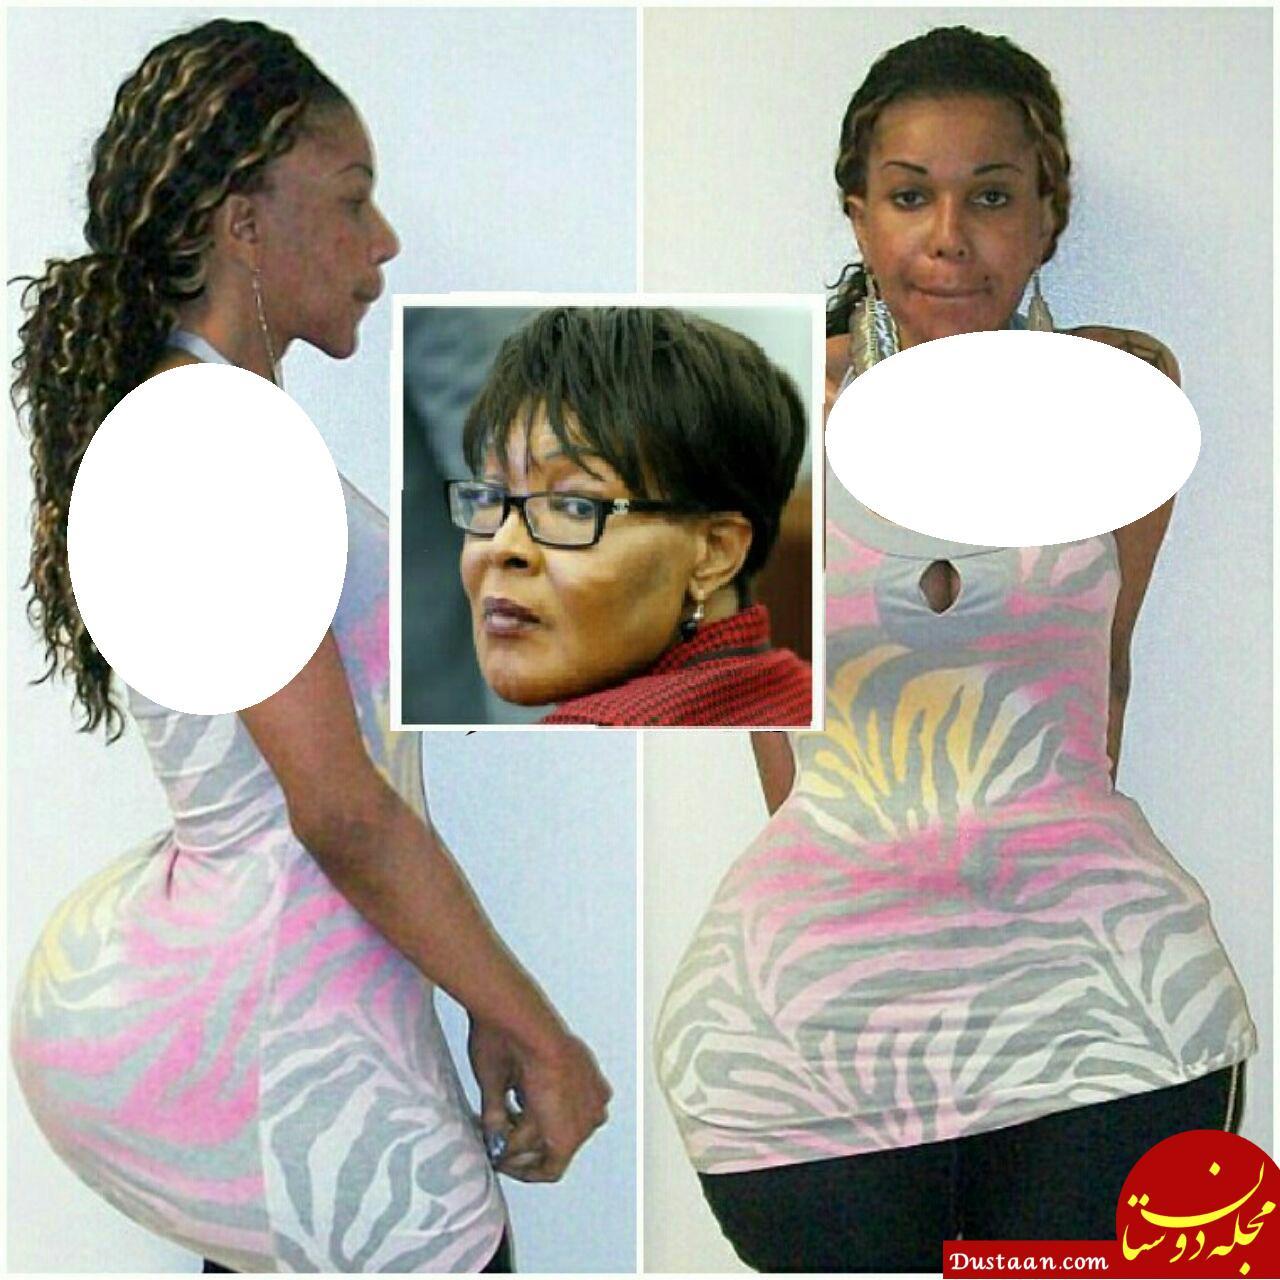 www.dustaan.com عاقبت تزریق ژل سیلیکنی غیراستاندارد به بدن یک زن! +عکس